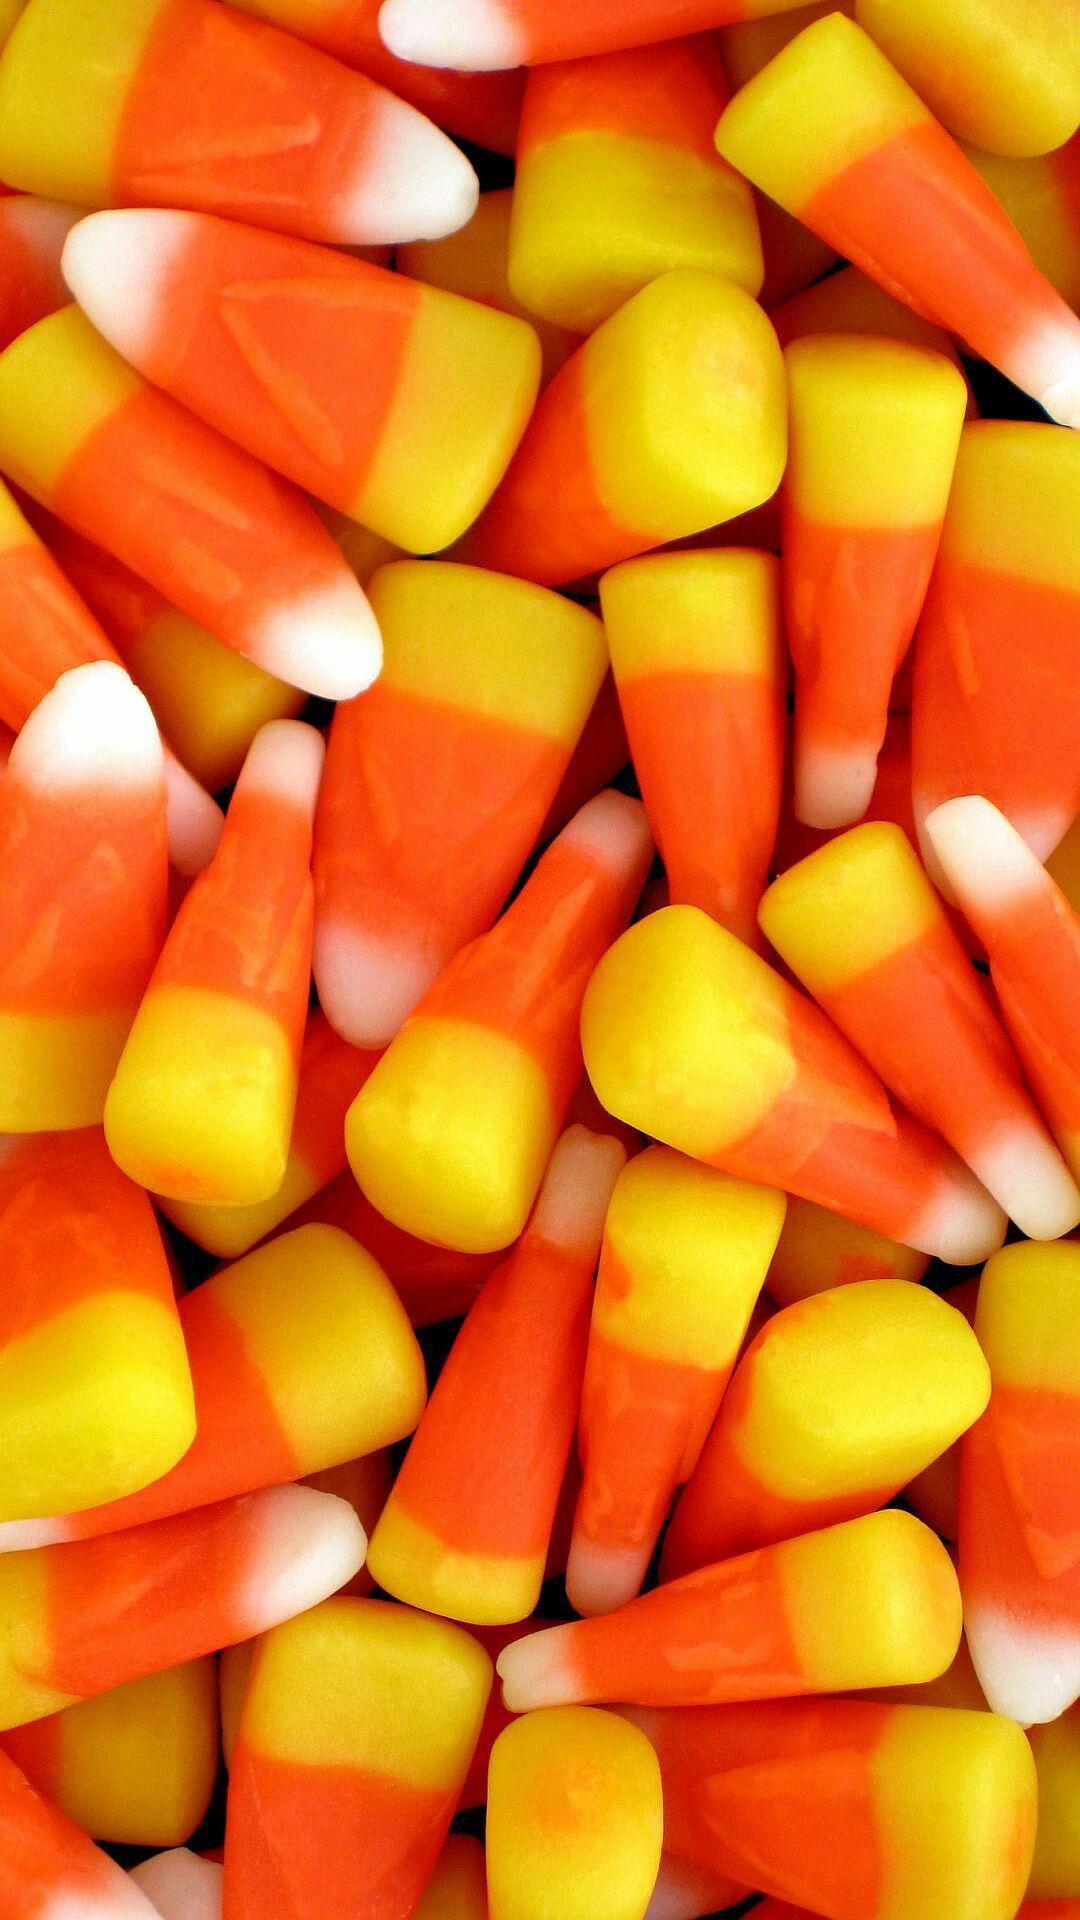 Random Candy Corn Worst Halloween Candy Organic Health Health